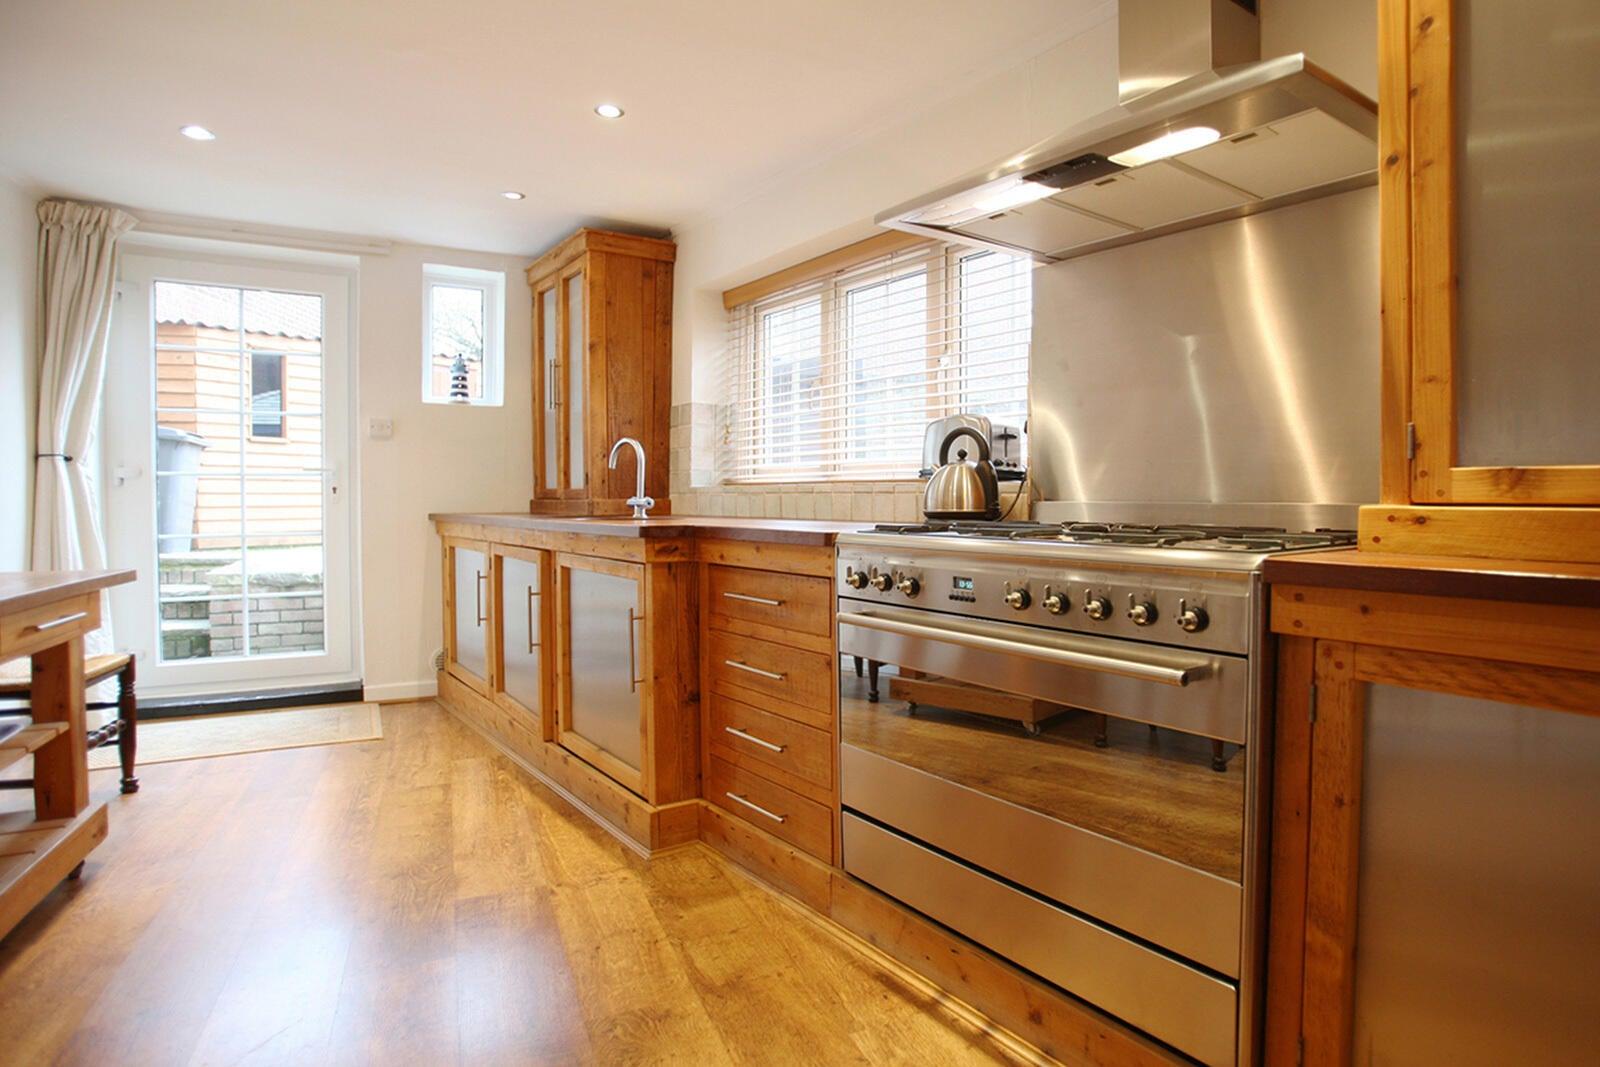 A range hood in a modern kitchen